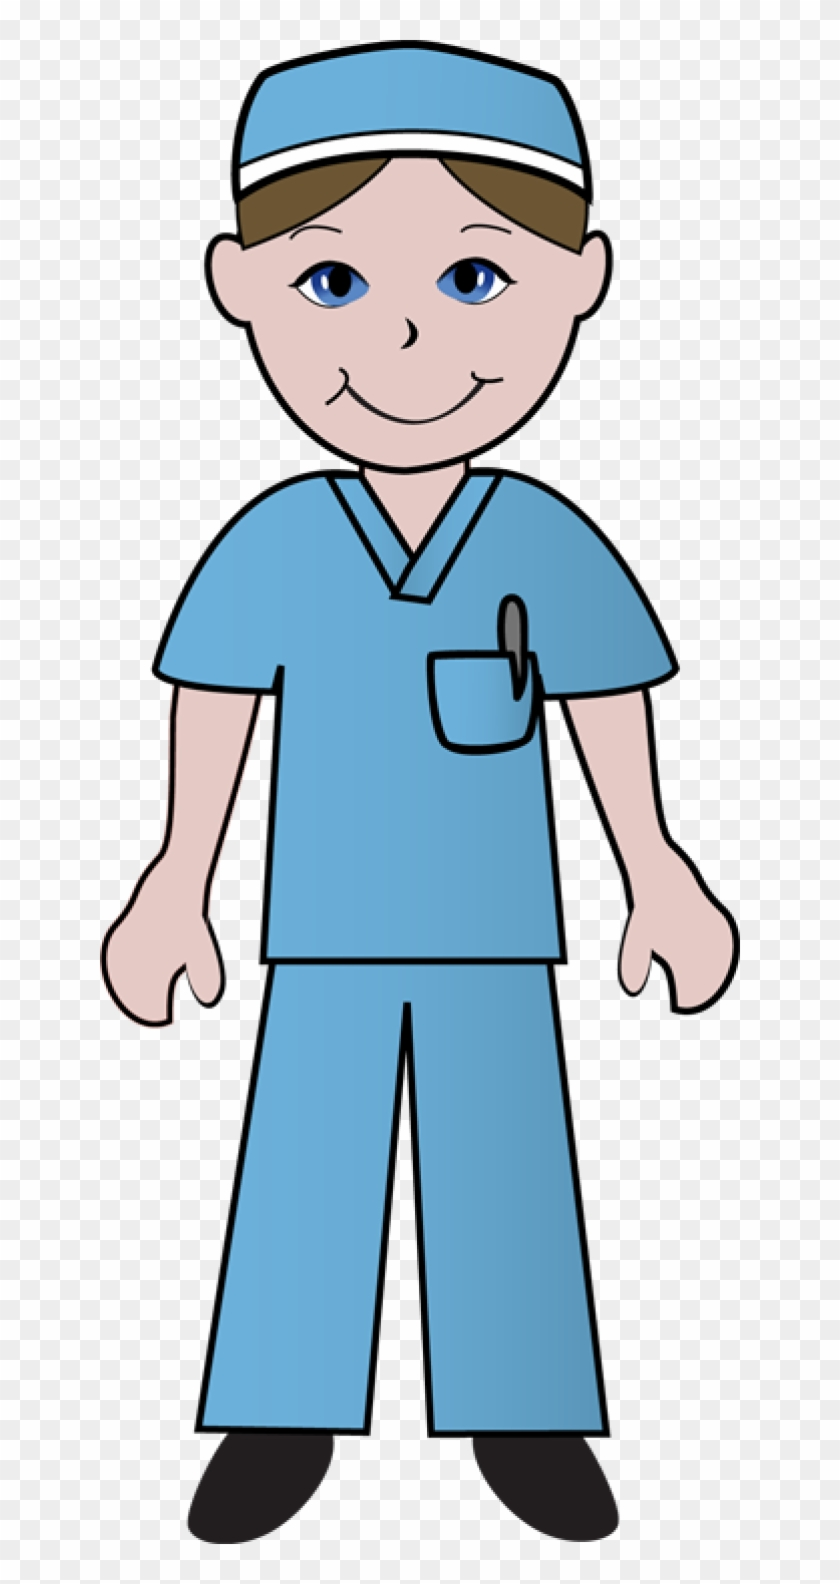 Medical - Male Nursing Clip Art #63926